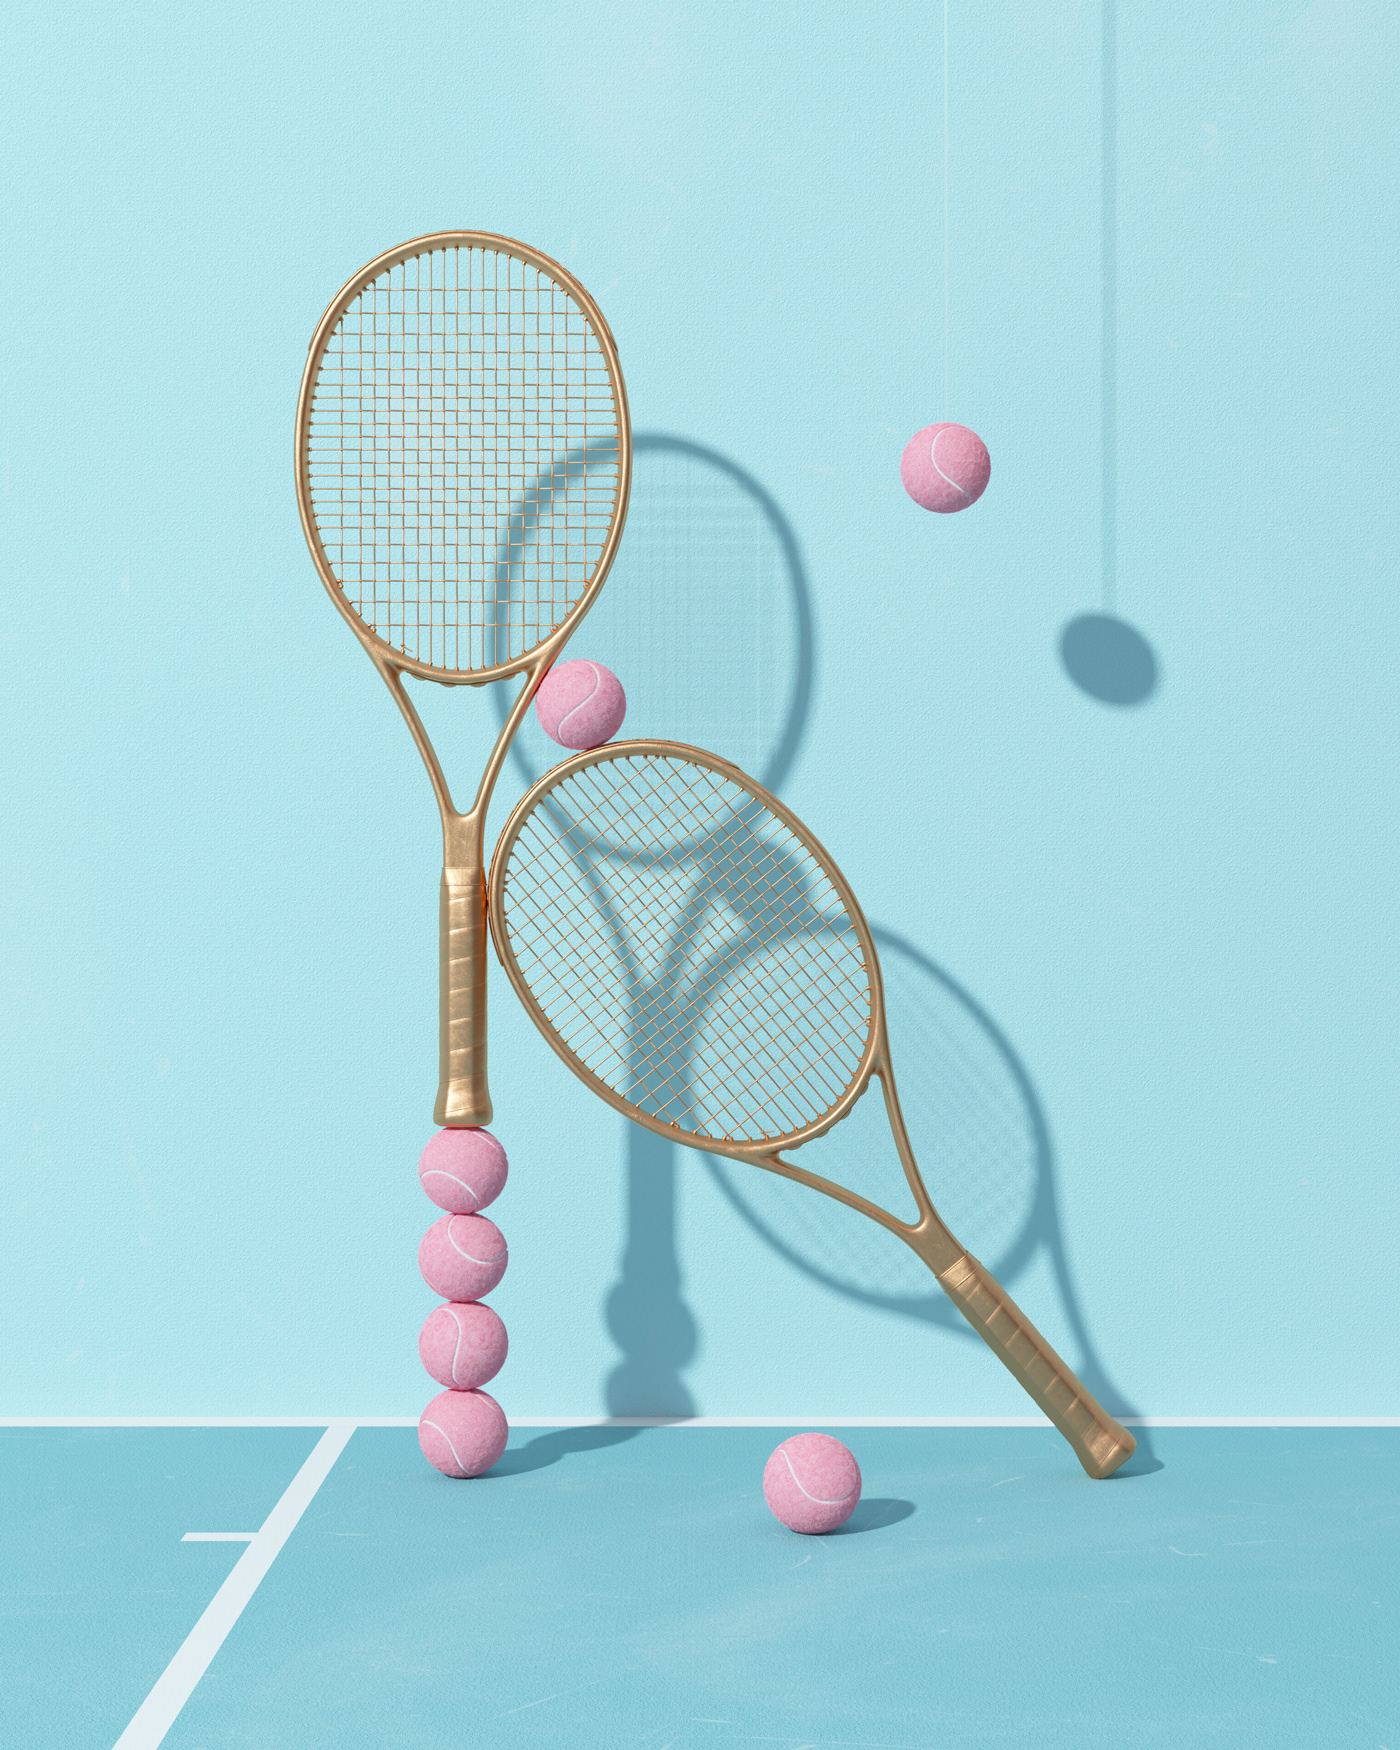 Tennis Illustration Series